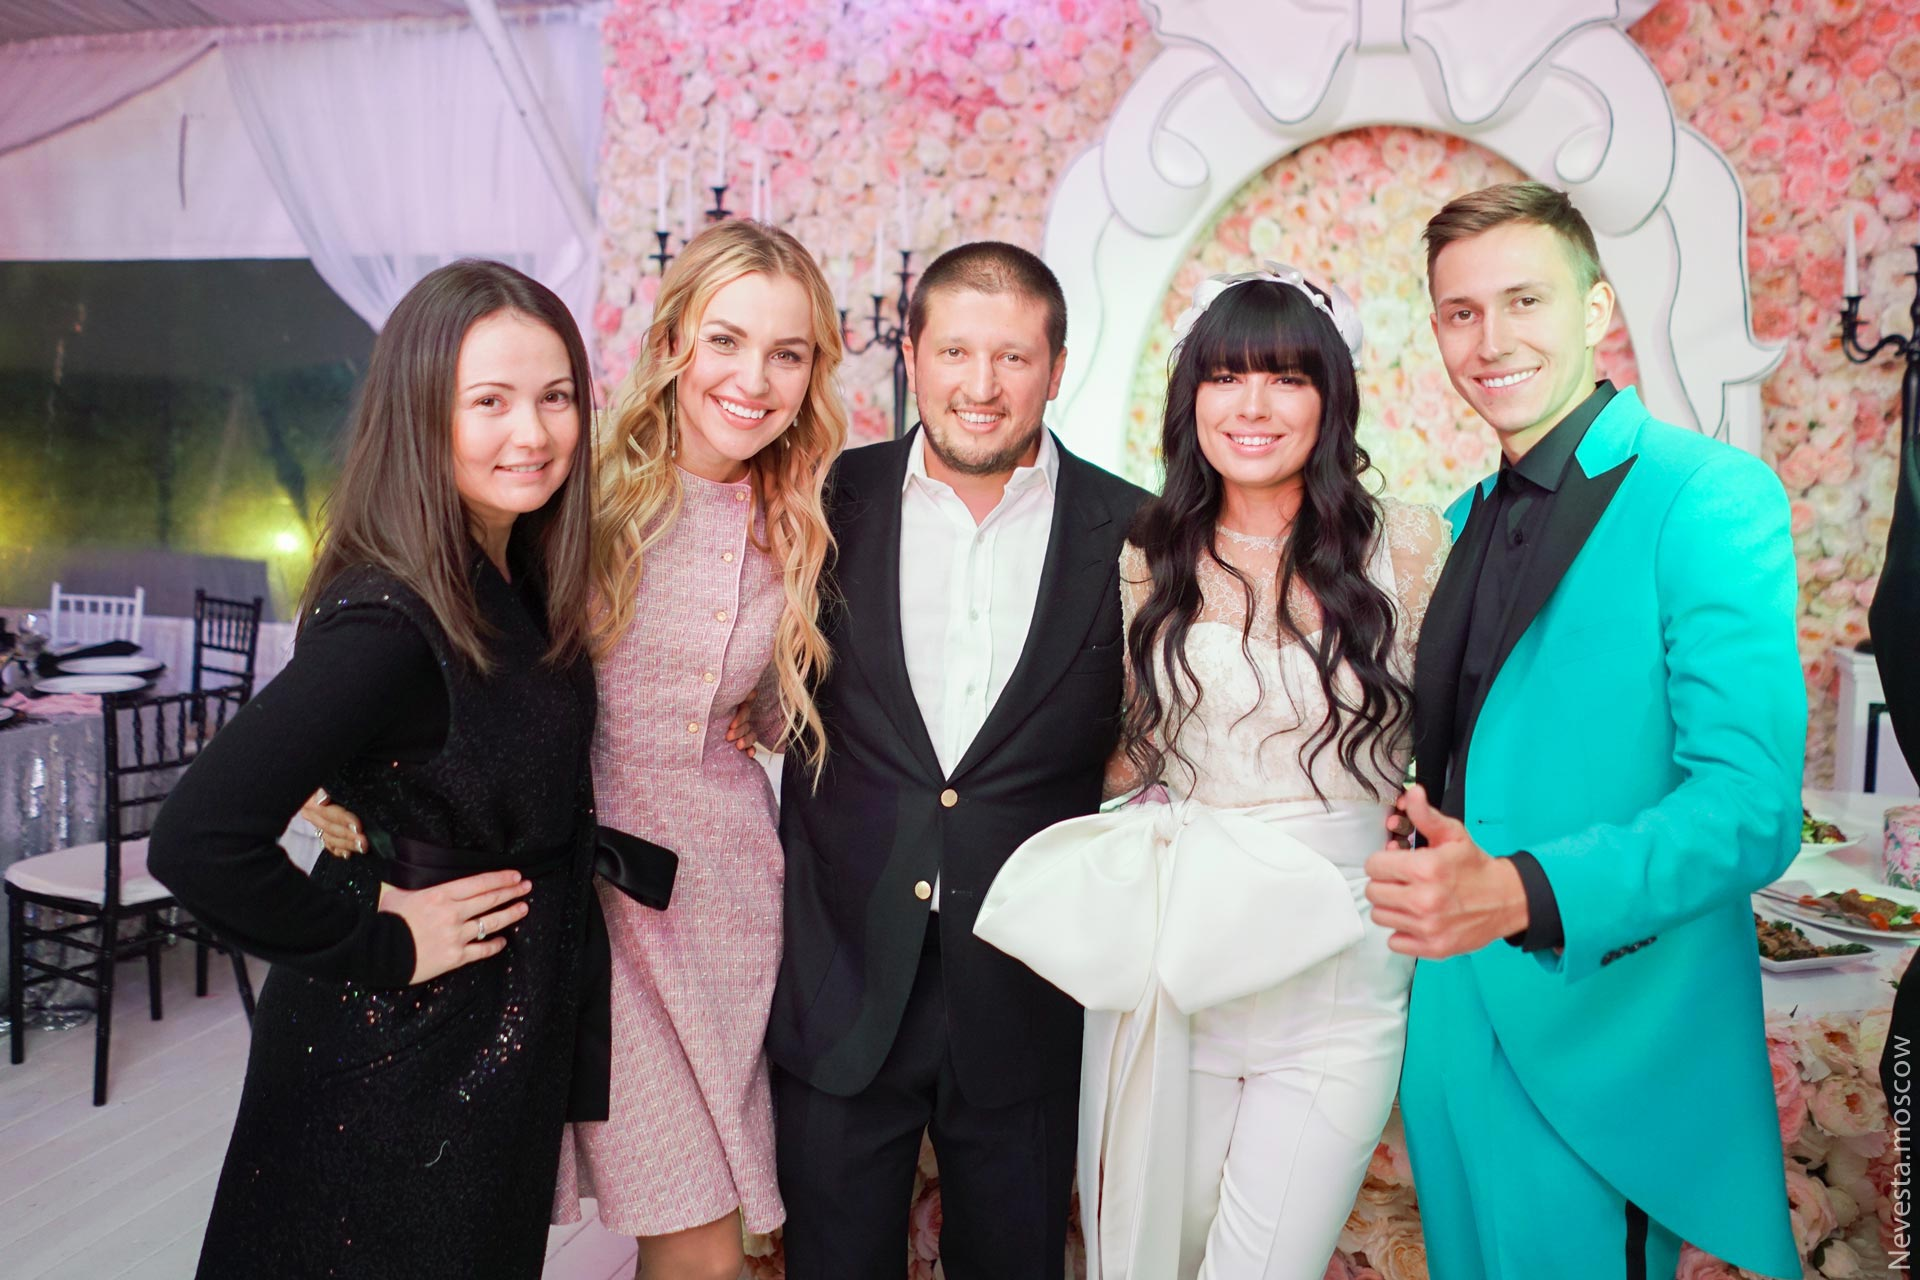 Свадьба Нелли Ермолаевой и Кирилла Андреева фото 46